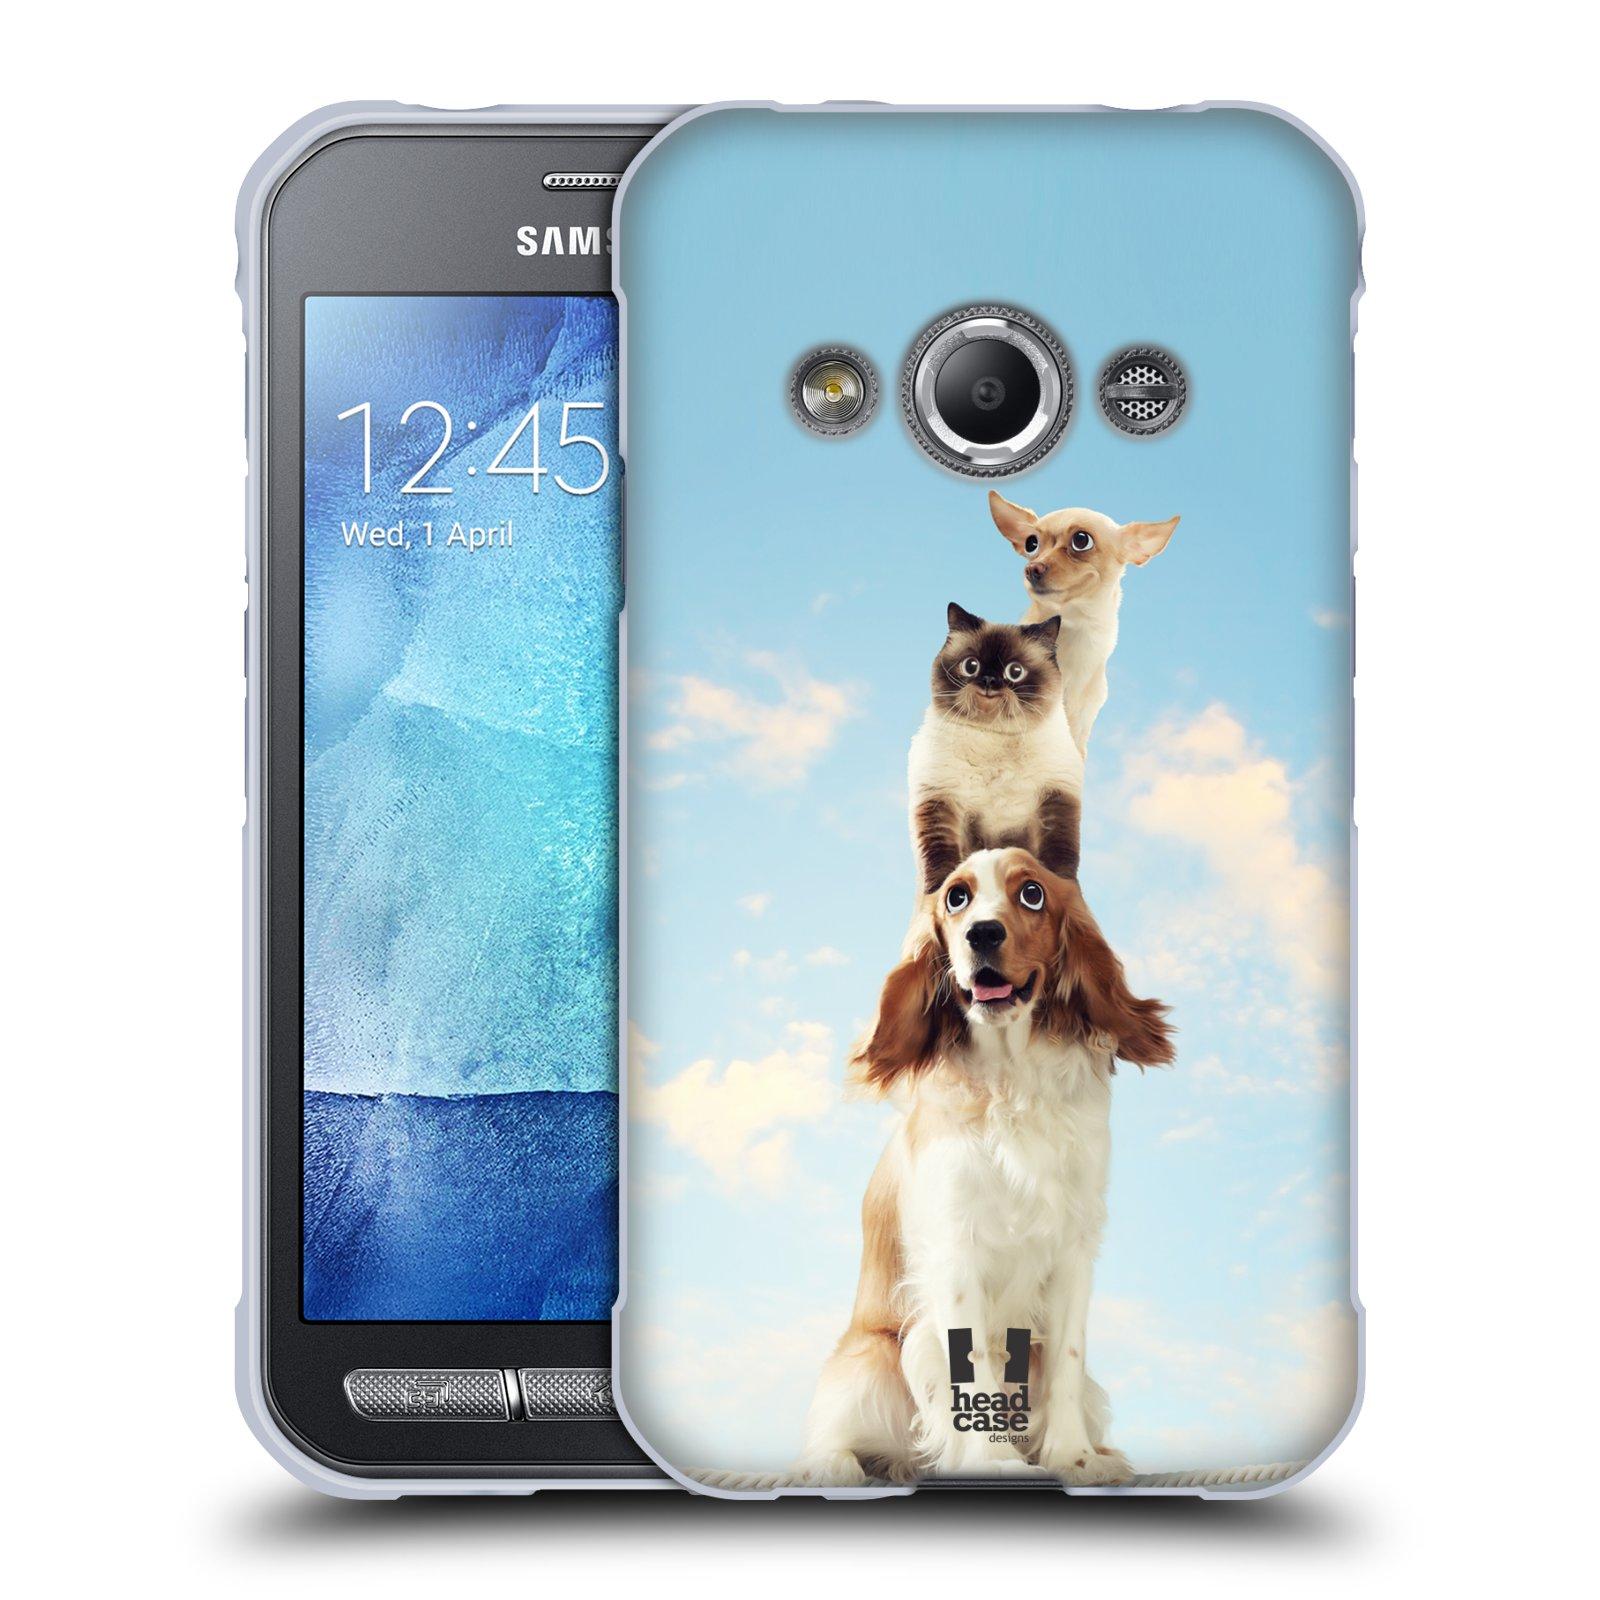 HEAD CASE silikonový obal na mobil Samsung Galaxy Xcover 3 vzor Legrační zvířátka zvířecí totem